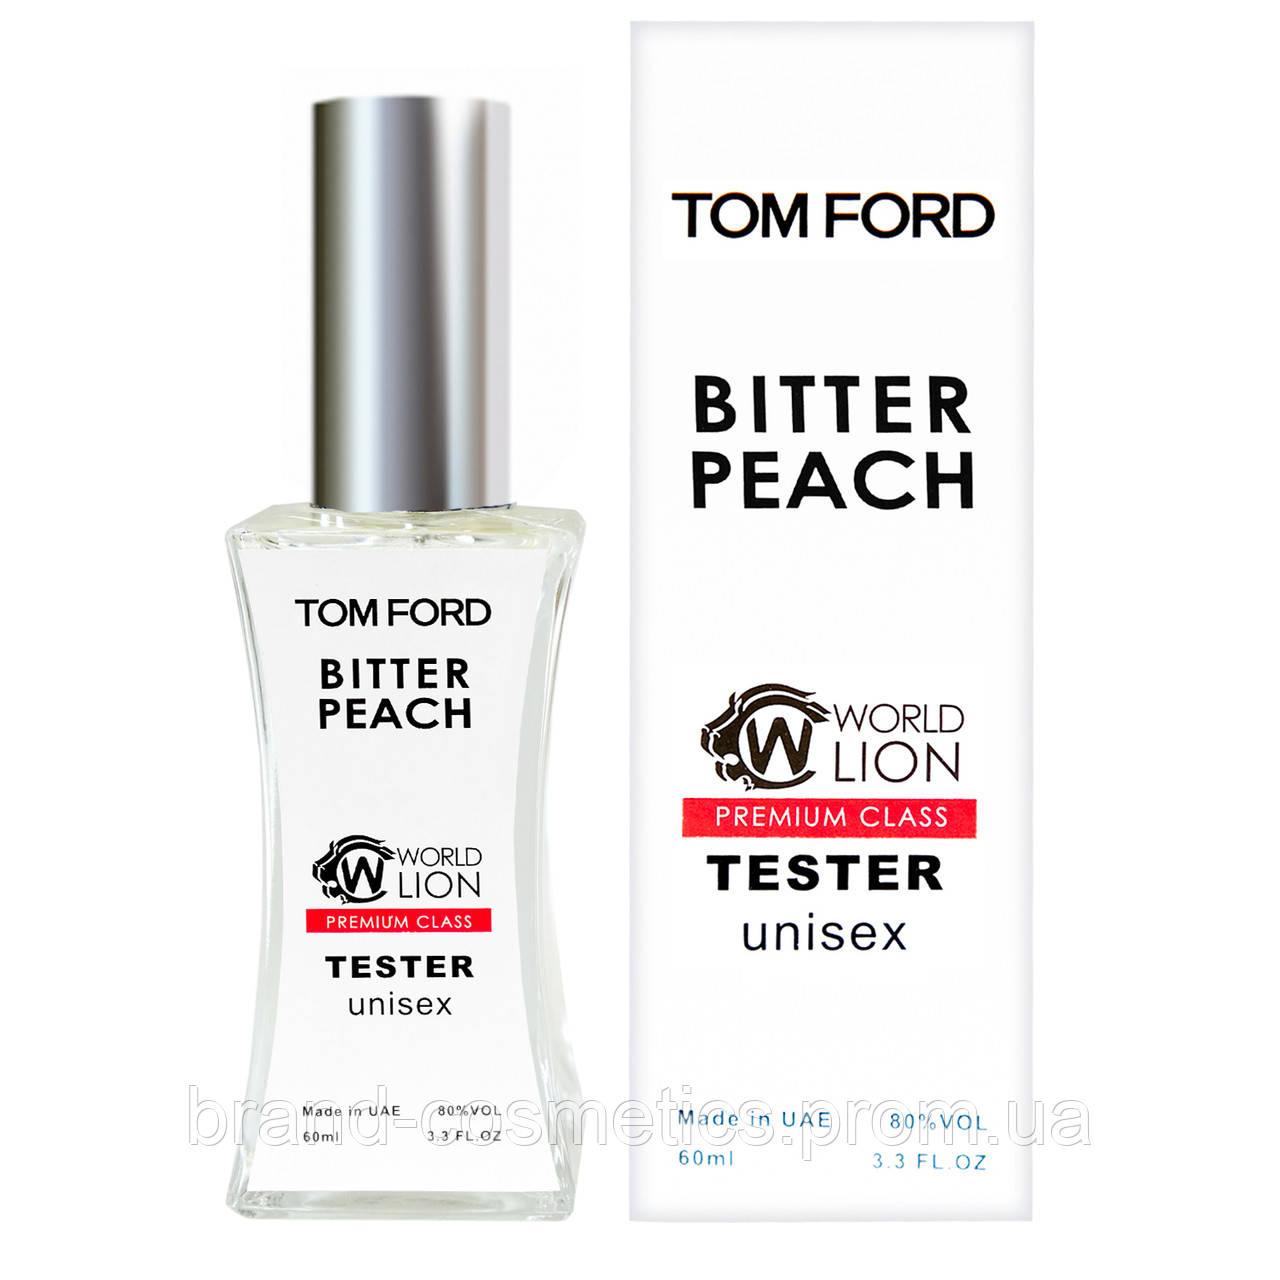 Тестер Premium Class Tom Ford Bitter Peach унисекс, 60 мл